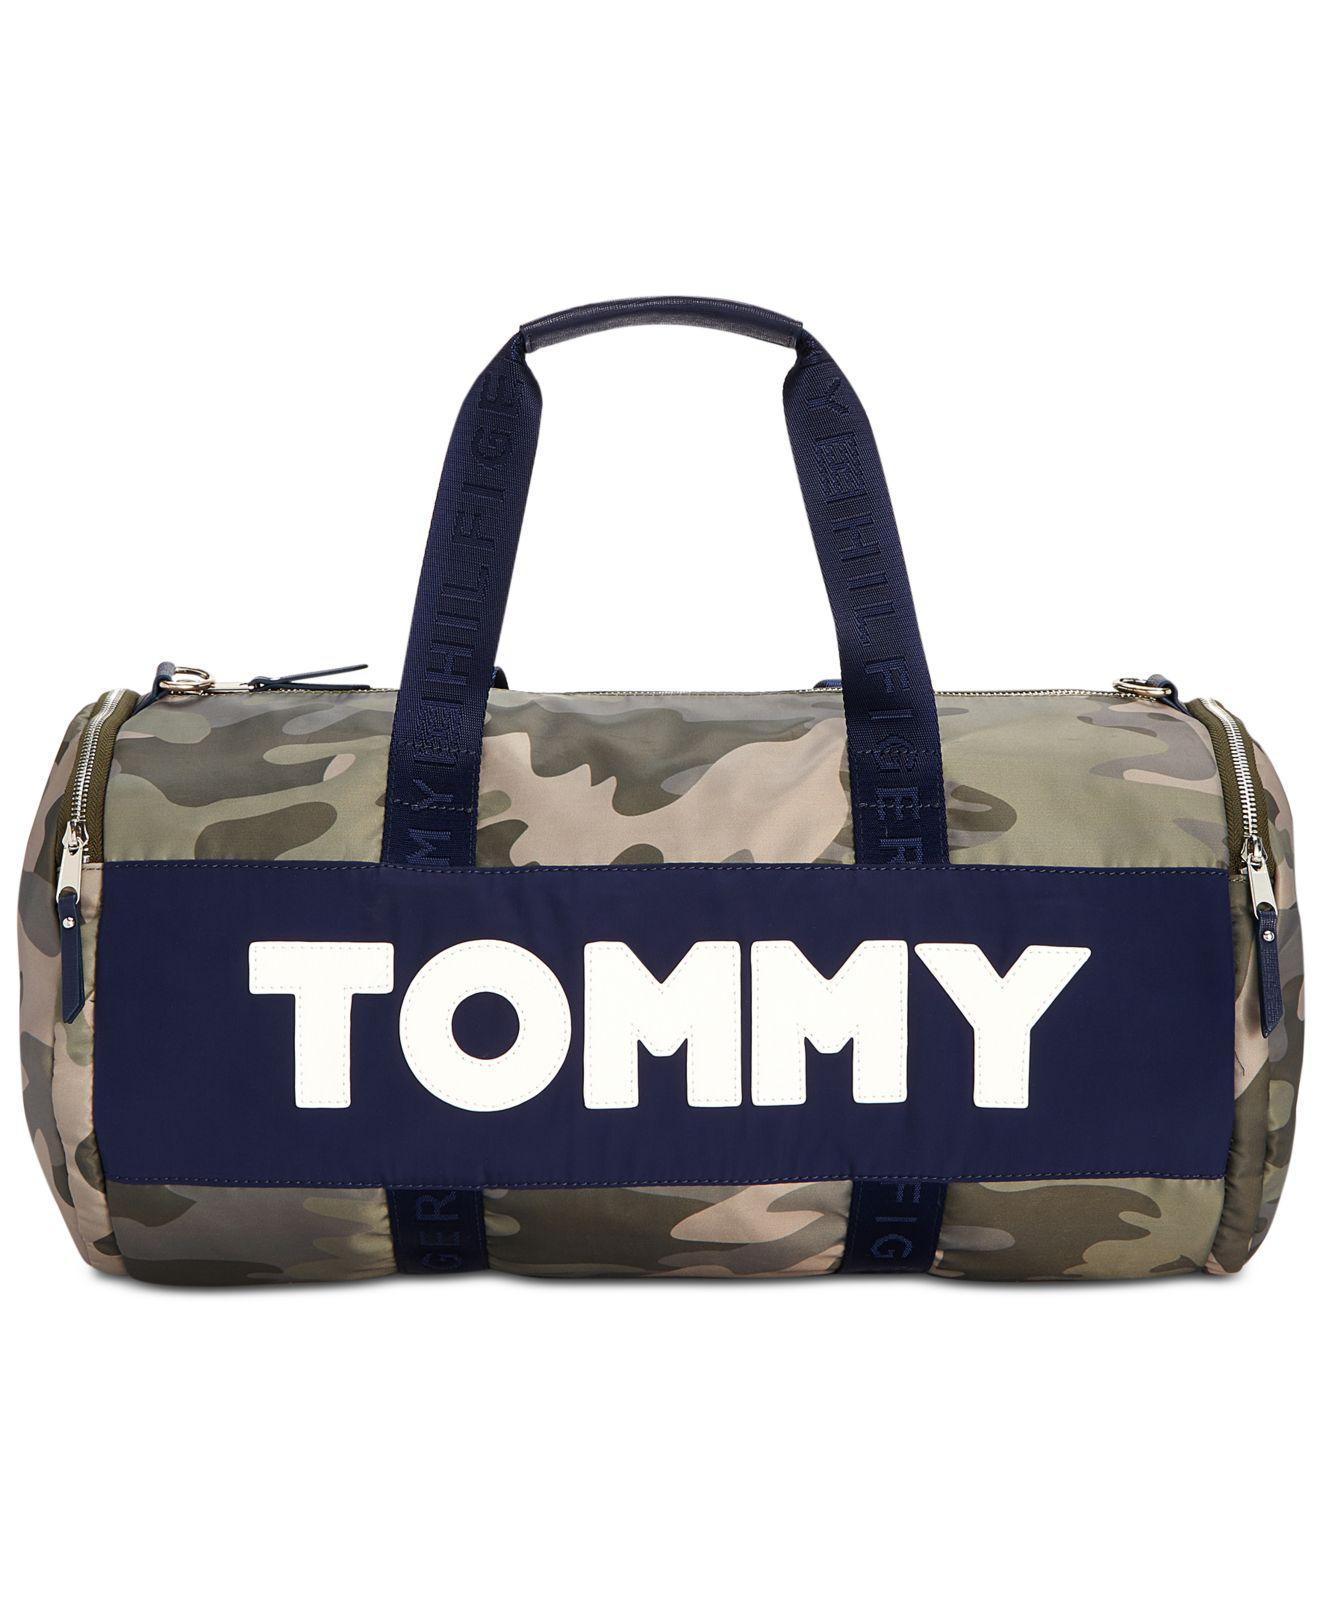 eaecc0906 Tommy Hilfiger Nylon Sporty Camo Duffle Bag - Lyst